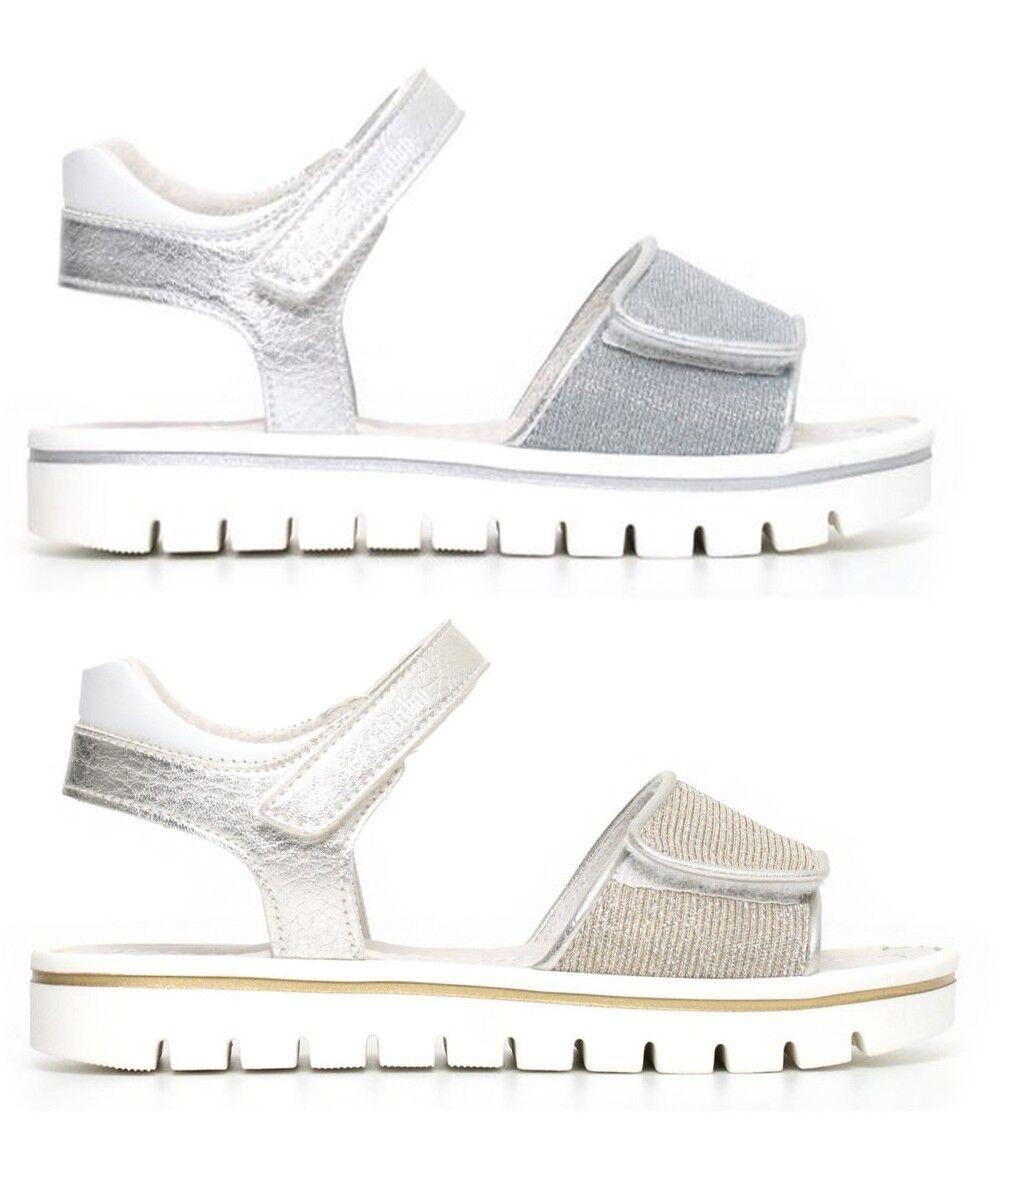 NERO GIARDINI TEEN P830500F scarpe donna bambina sandali pelle glitter zeppa